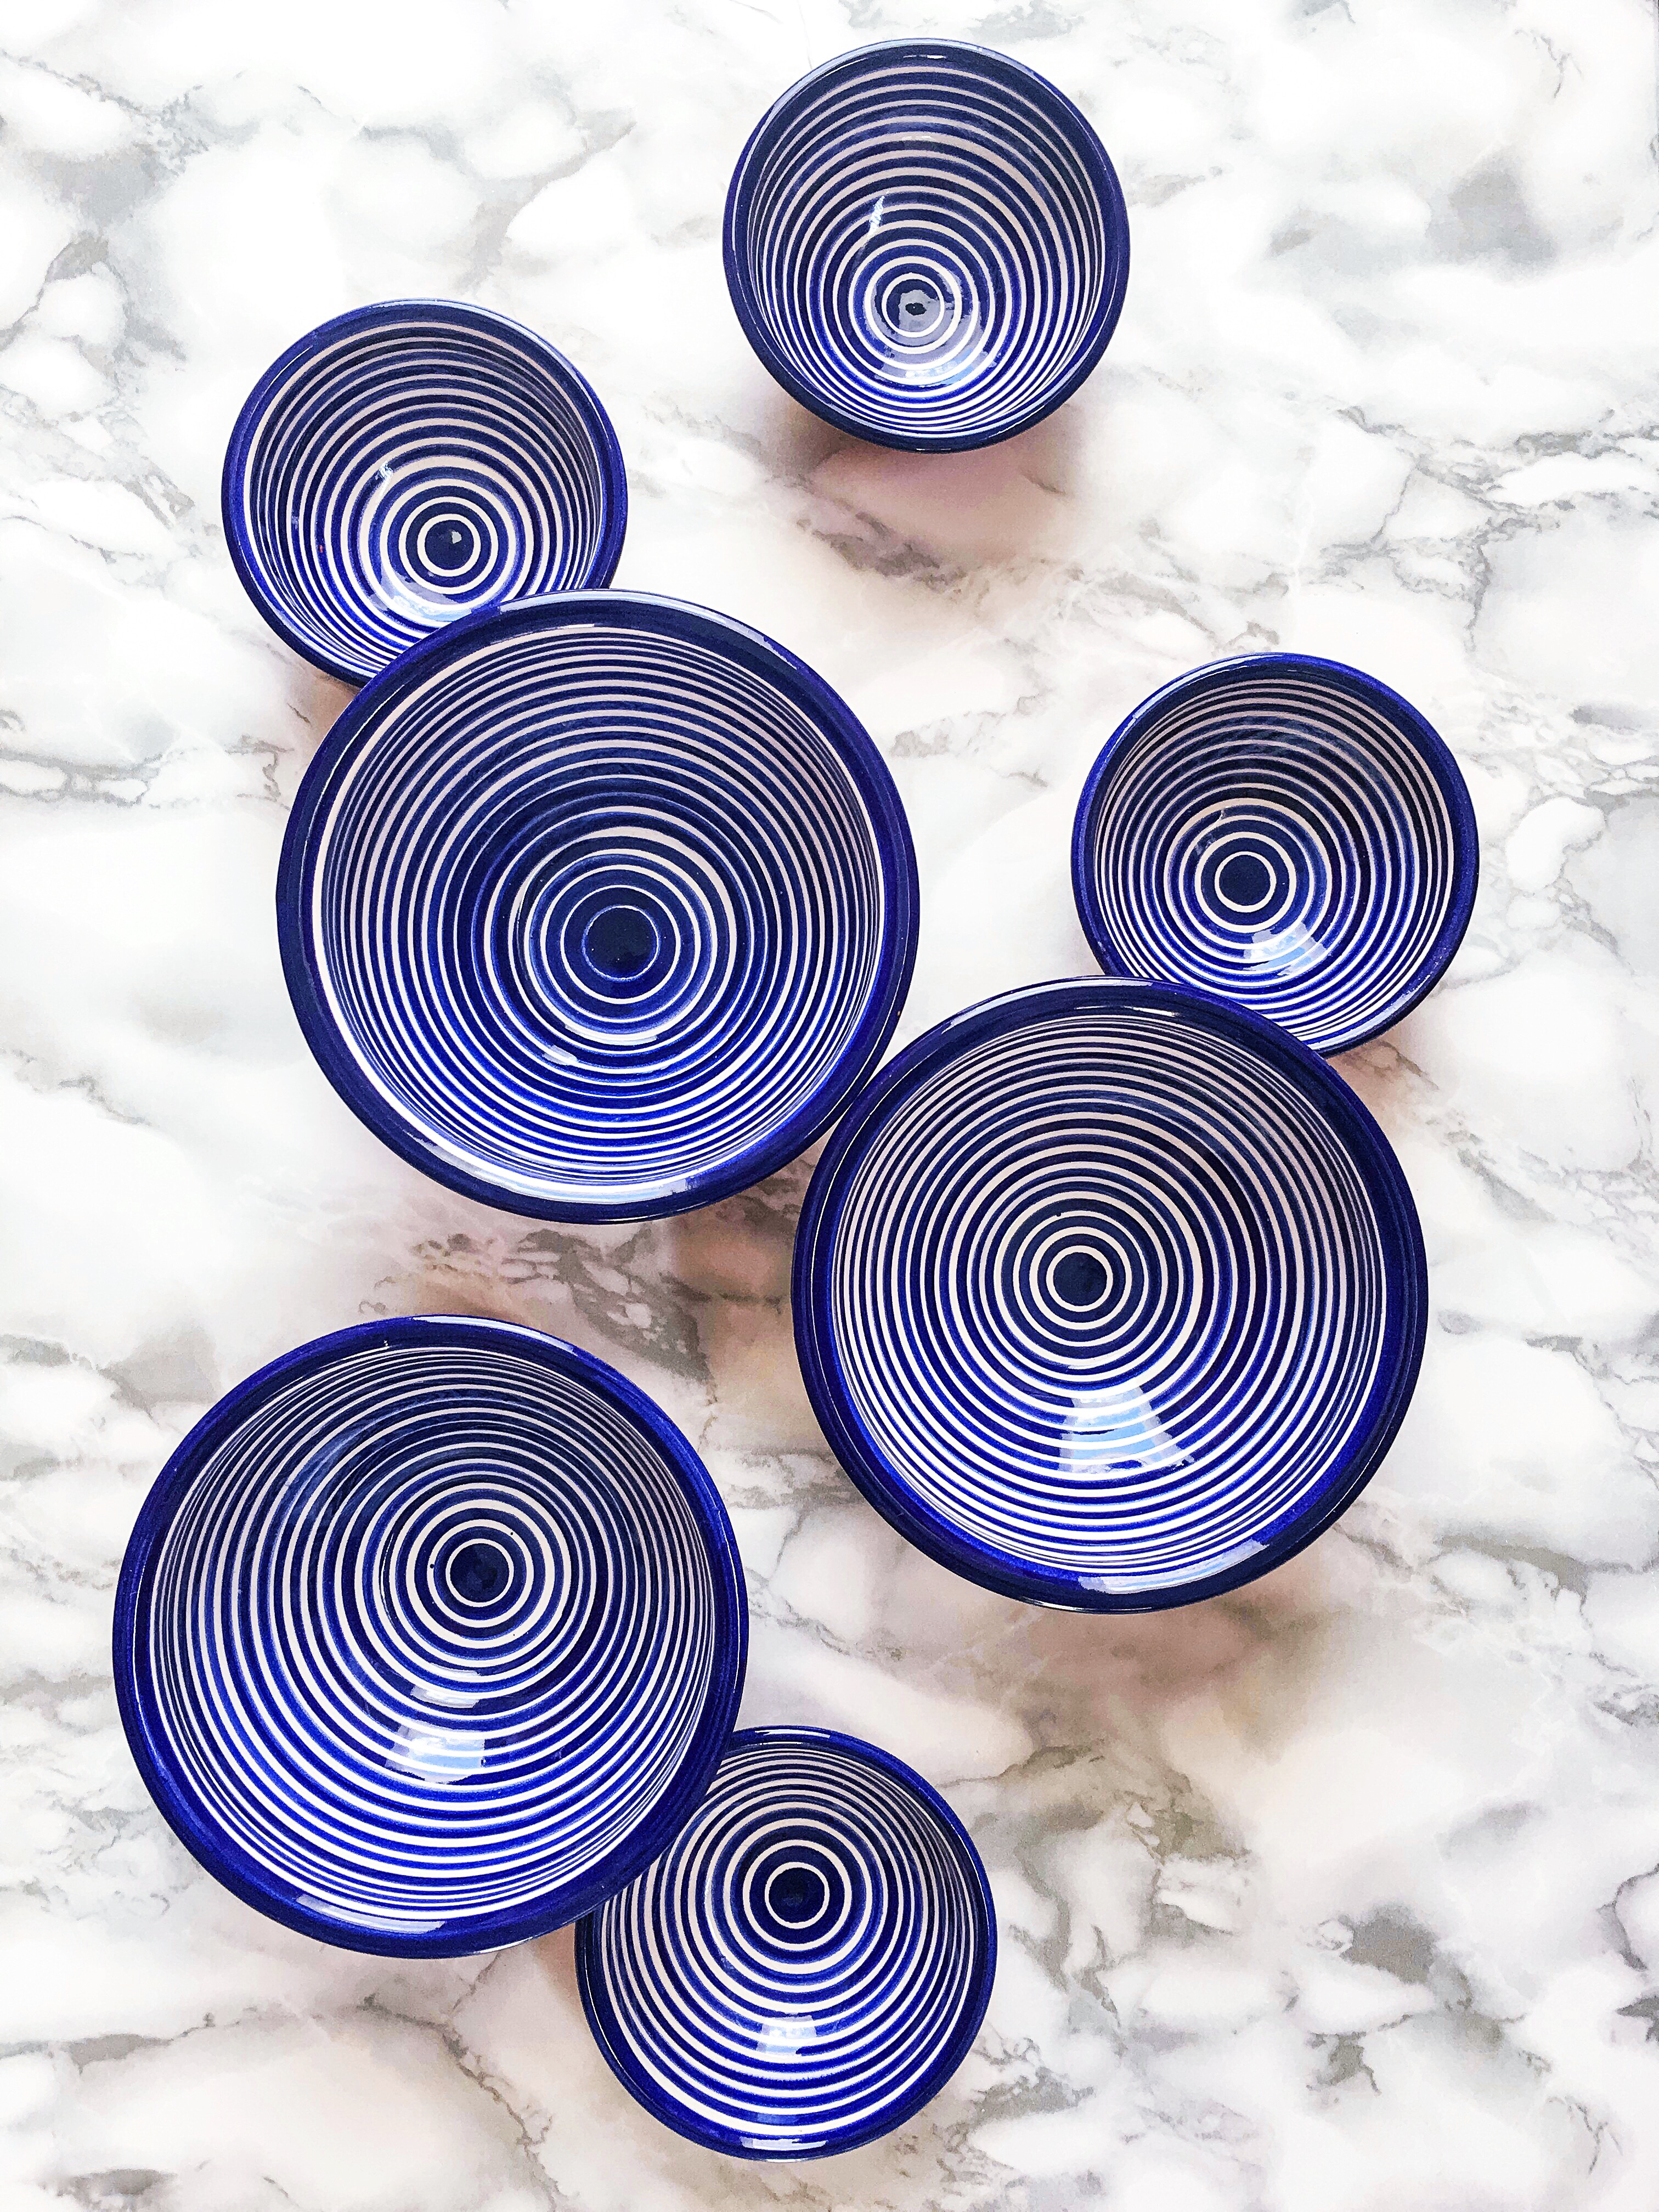 casa-cubista-classic-portugese-blue-bowls